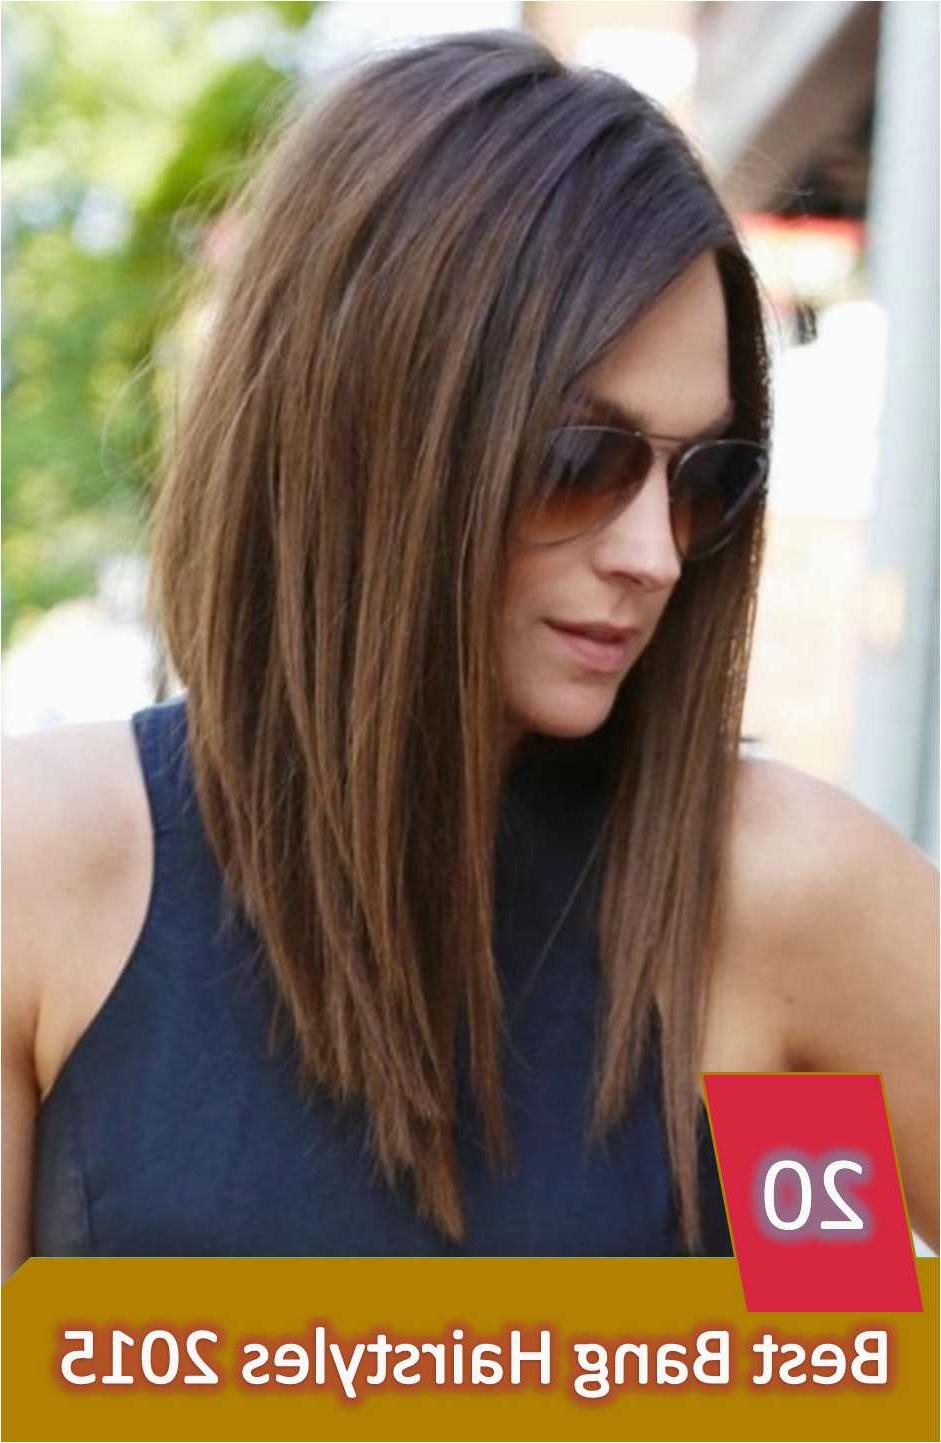 25 Elegant Medium Shaggy Hairstyles Plan | Best Hairstyles Ideas For Short To Medium Shaggy Hairstyles (View 23 of 25)